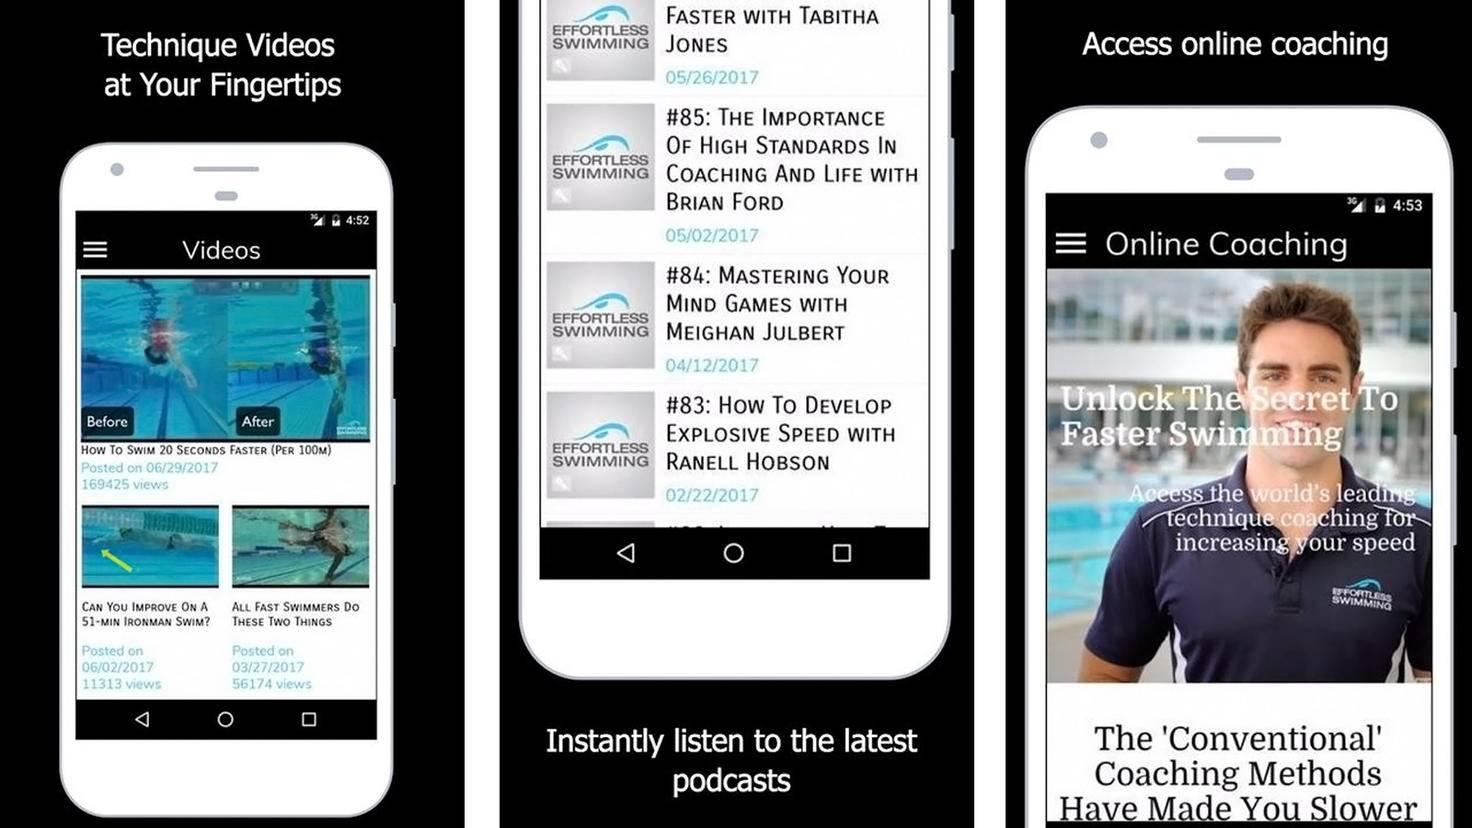 Effortless Swimming-App-Google Play Store-Effortless Swimming